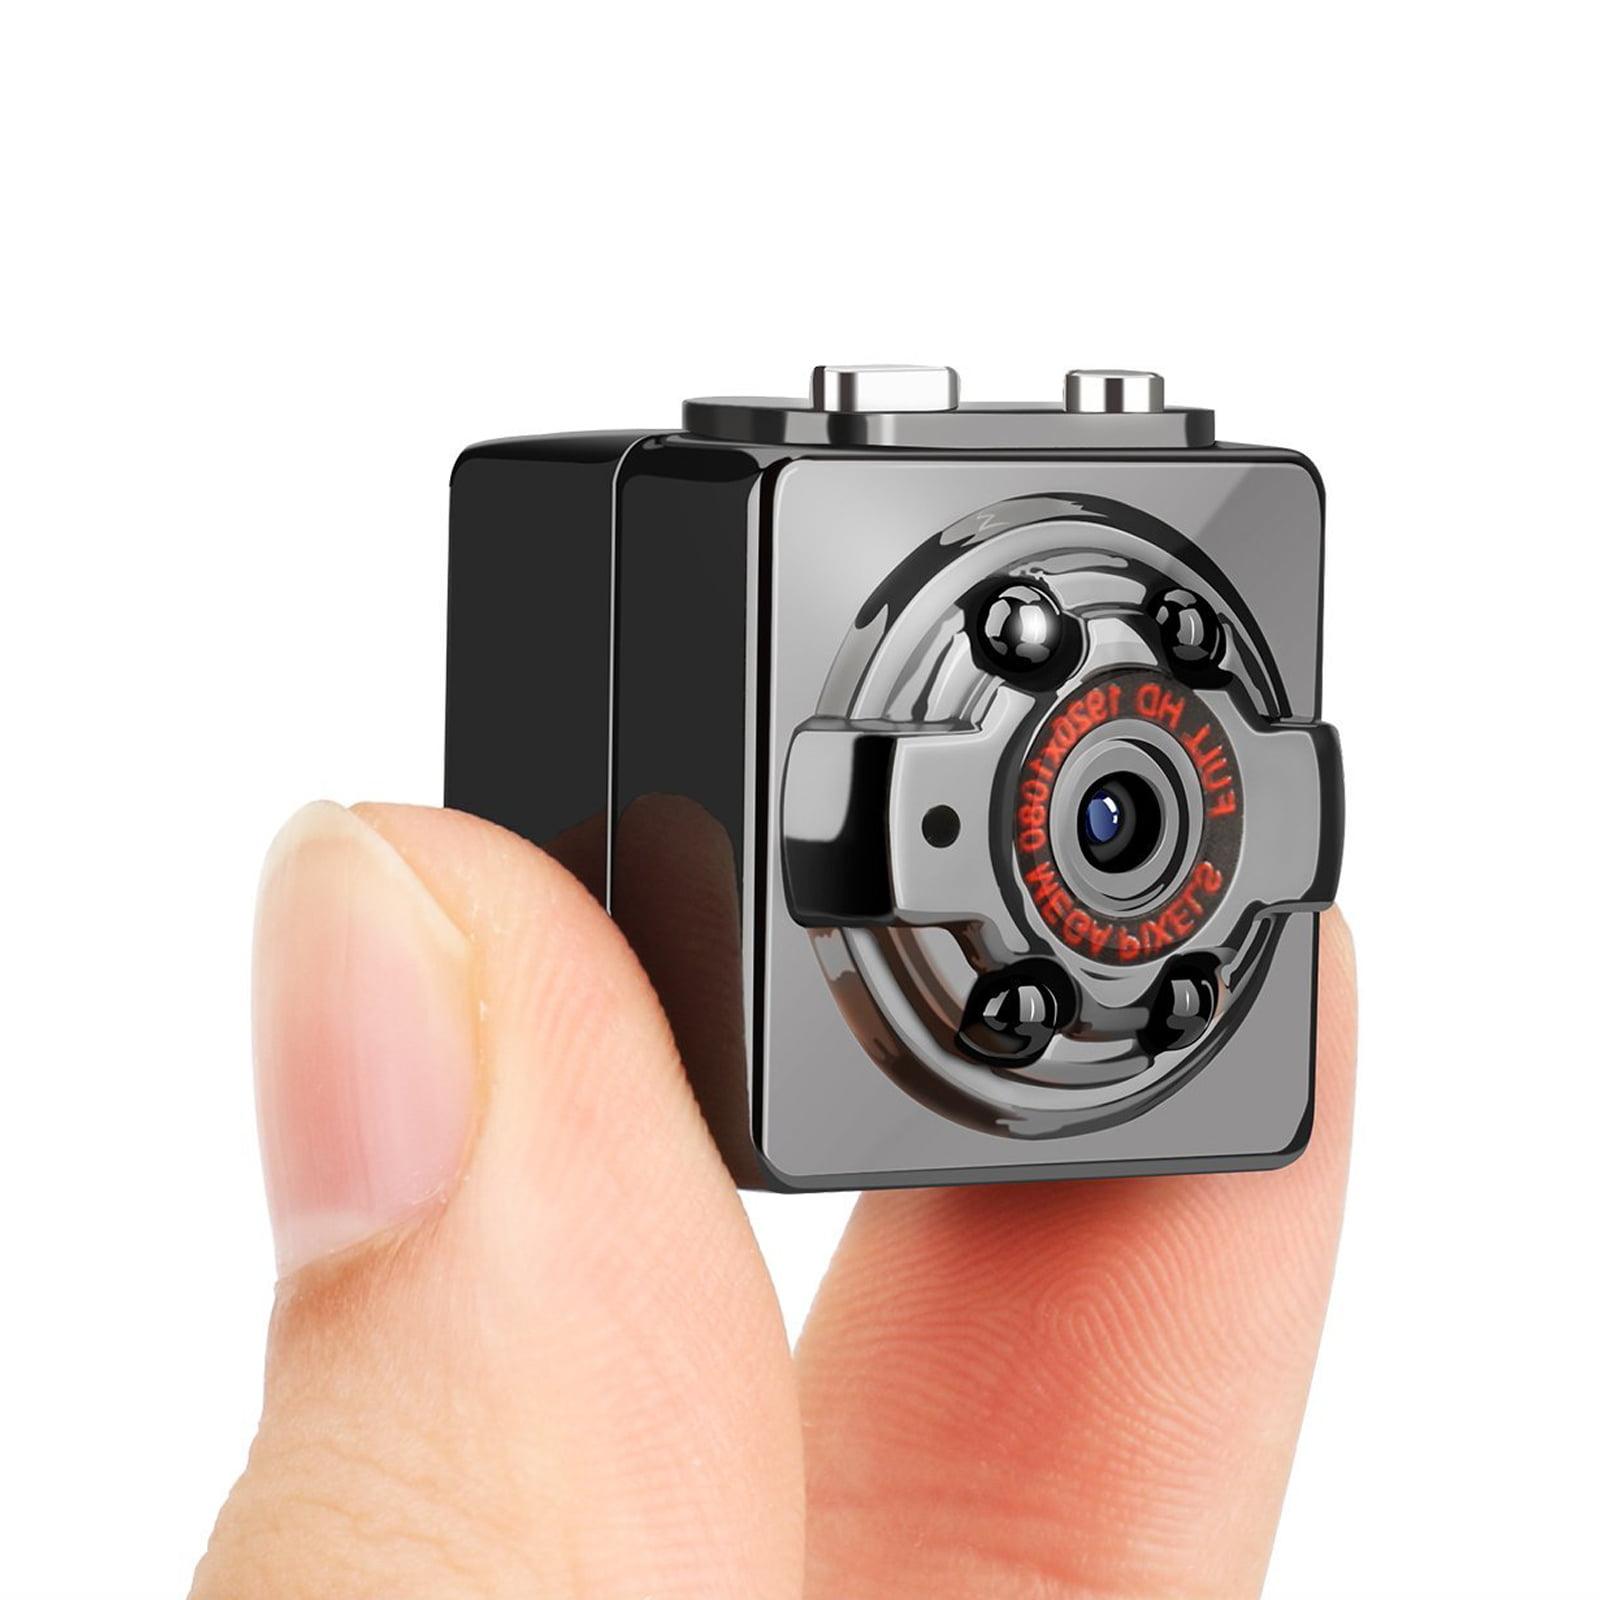 TSV SQ8 Mini DV Camera 1080p Full HD Car DVR Body Motion Detection Night Vision Nanny Video Recorder Camcorder For Home Security